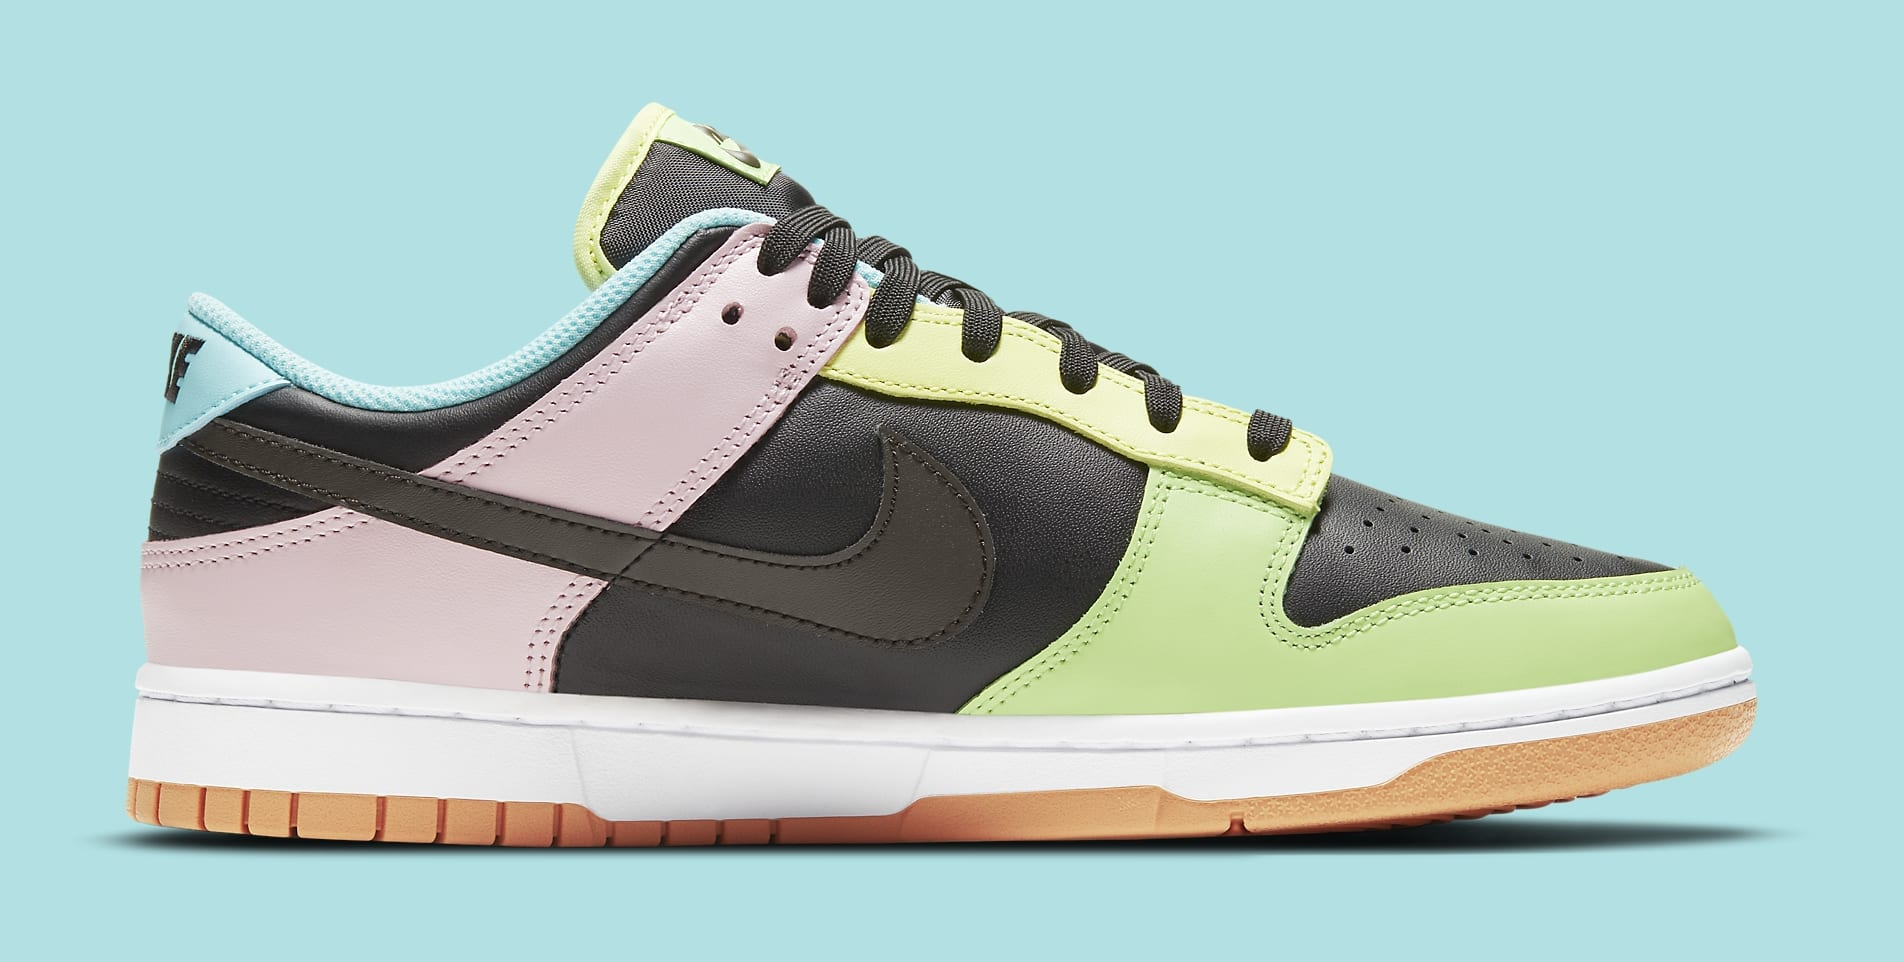 Nike Dunk Low 'Free.99' Black DH0952-001 Medial